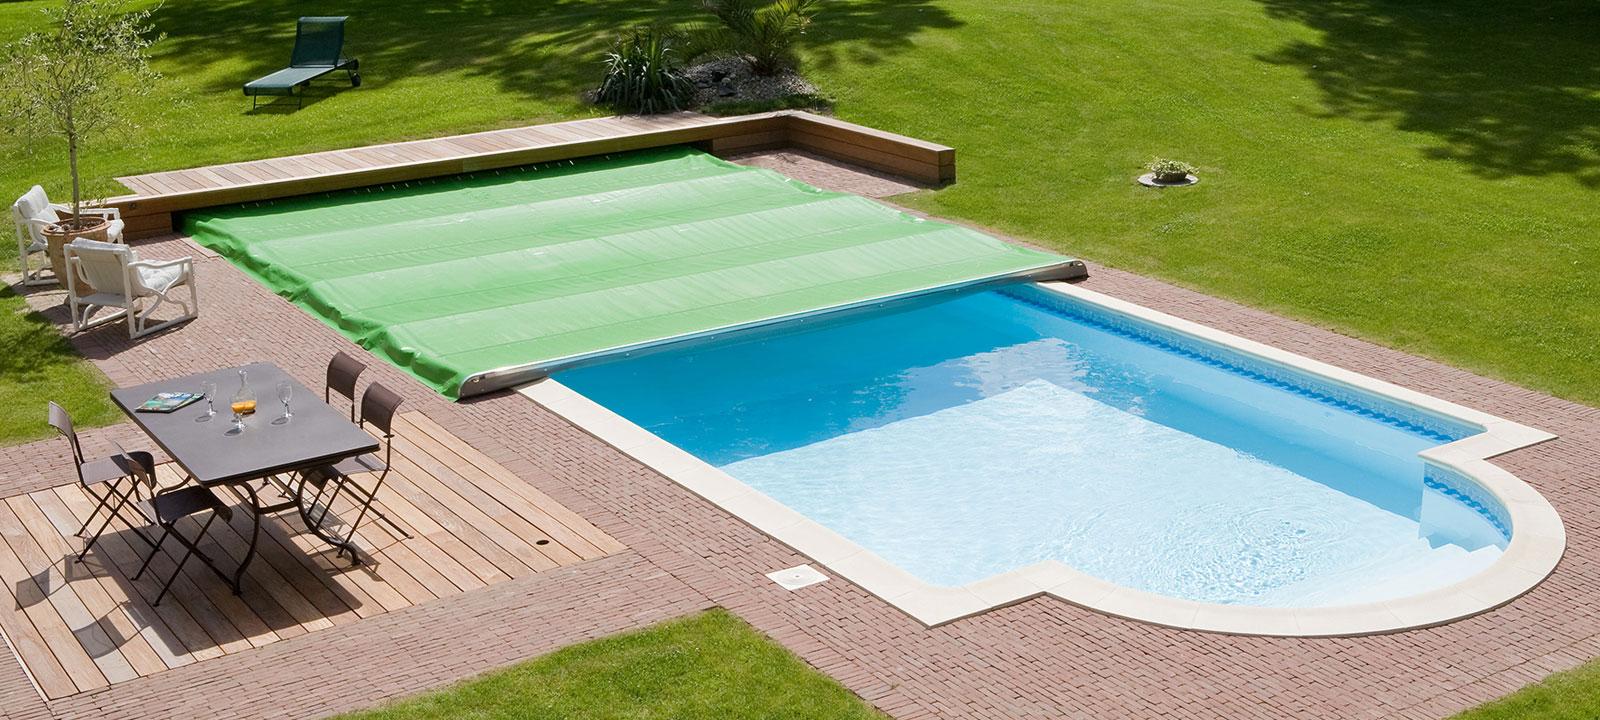 bache piscine castorama. Black Bedroom Furniture Sets. Home Design Ideas